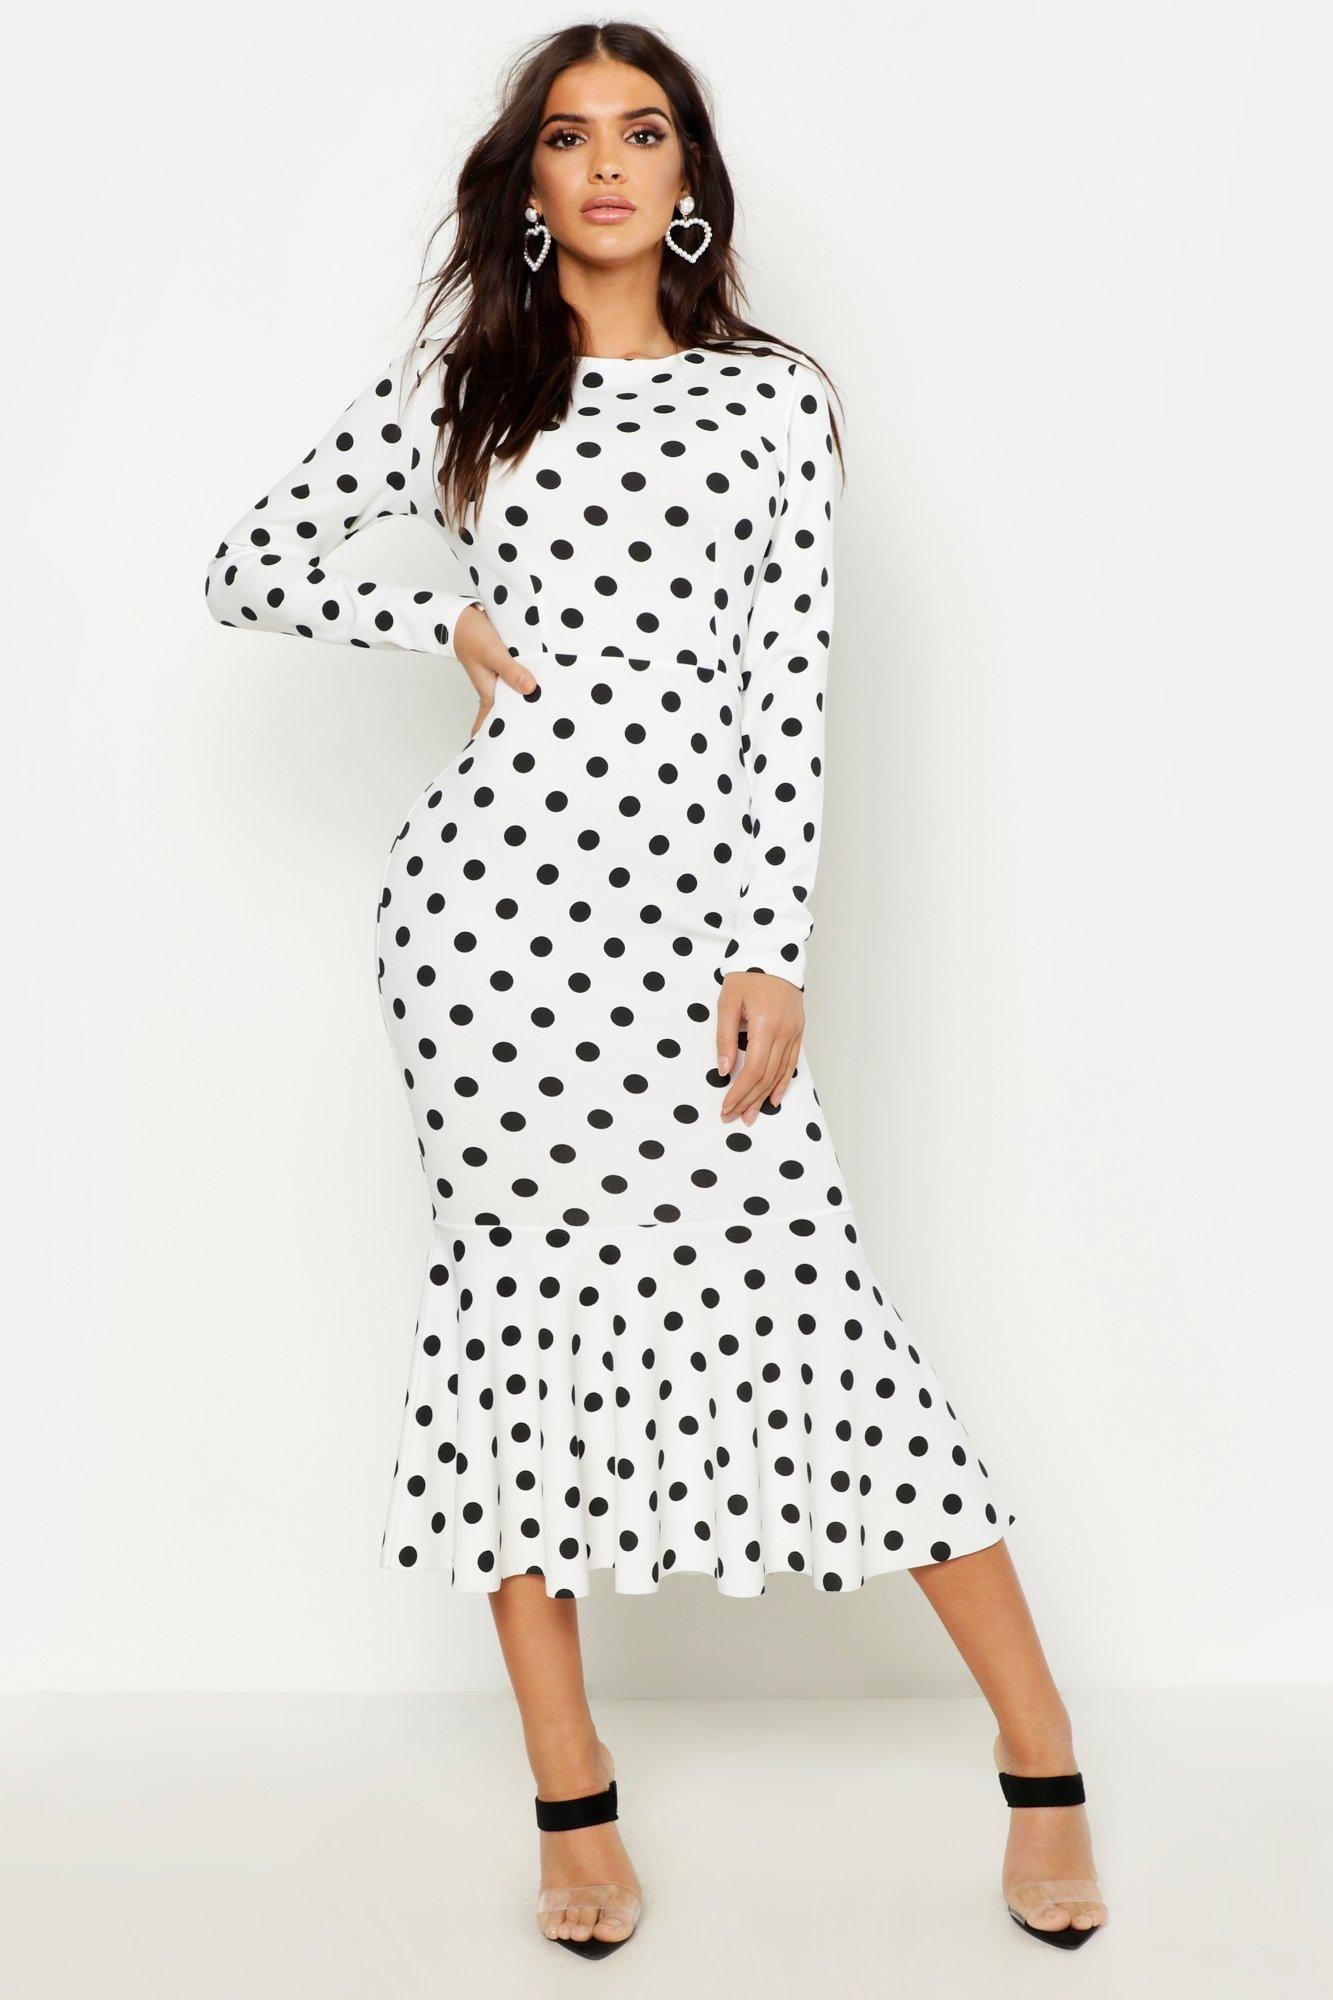 Polka Dot Fishtail Long Sleeved Midaxi Dress Polka Dot Skirt Outfit Dot Dress Outfit Dot Skirt Outfit [ 2000 x 1333 Pixel ]